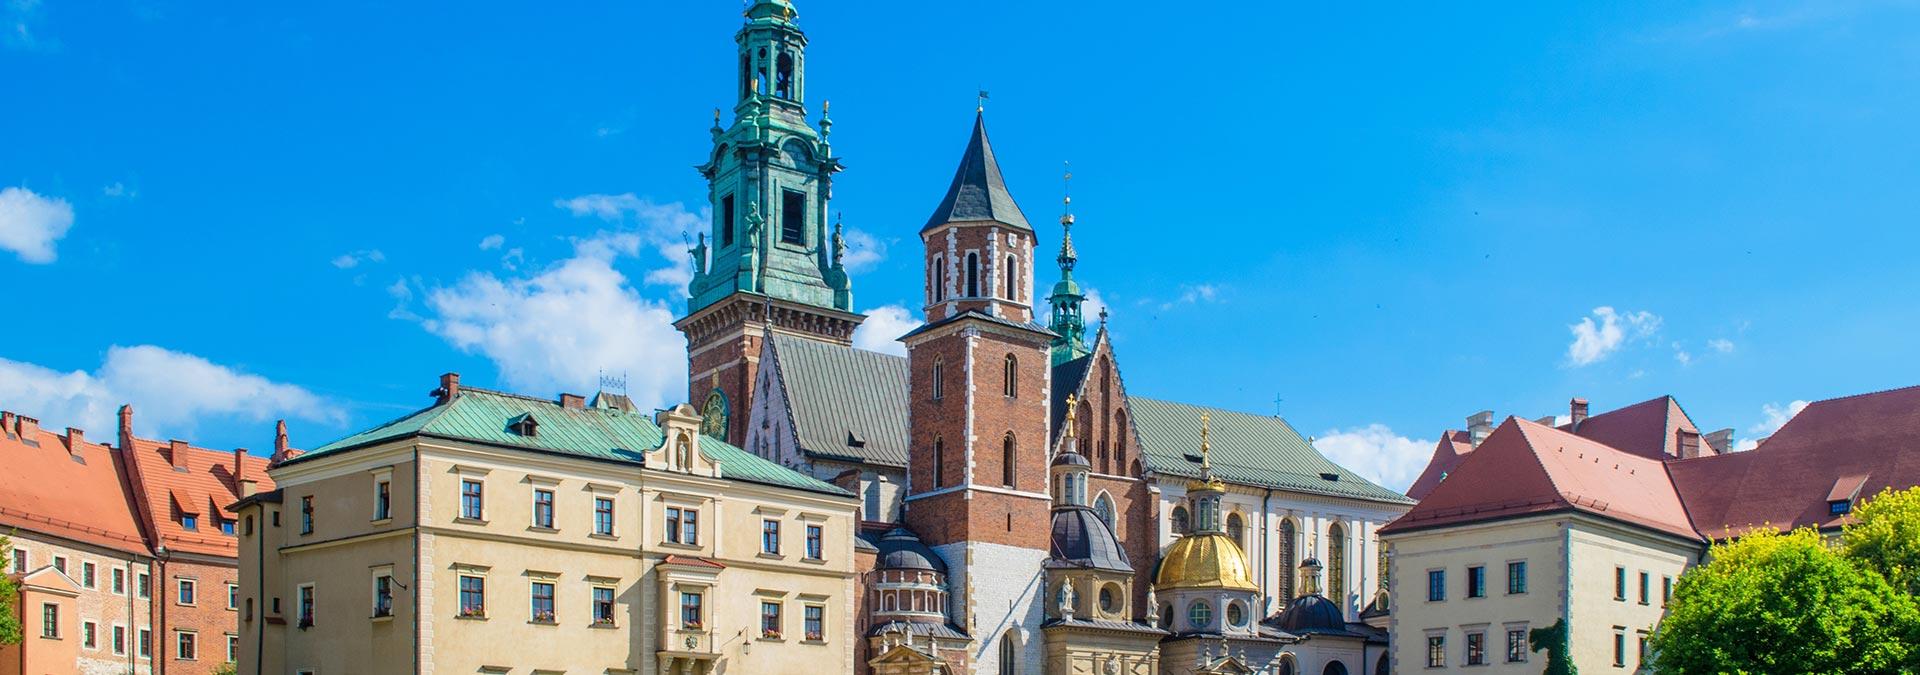 blog hungary slovakia austria tour